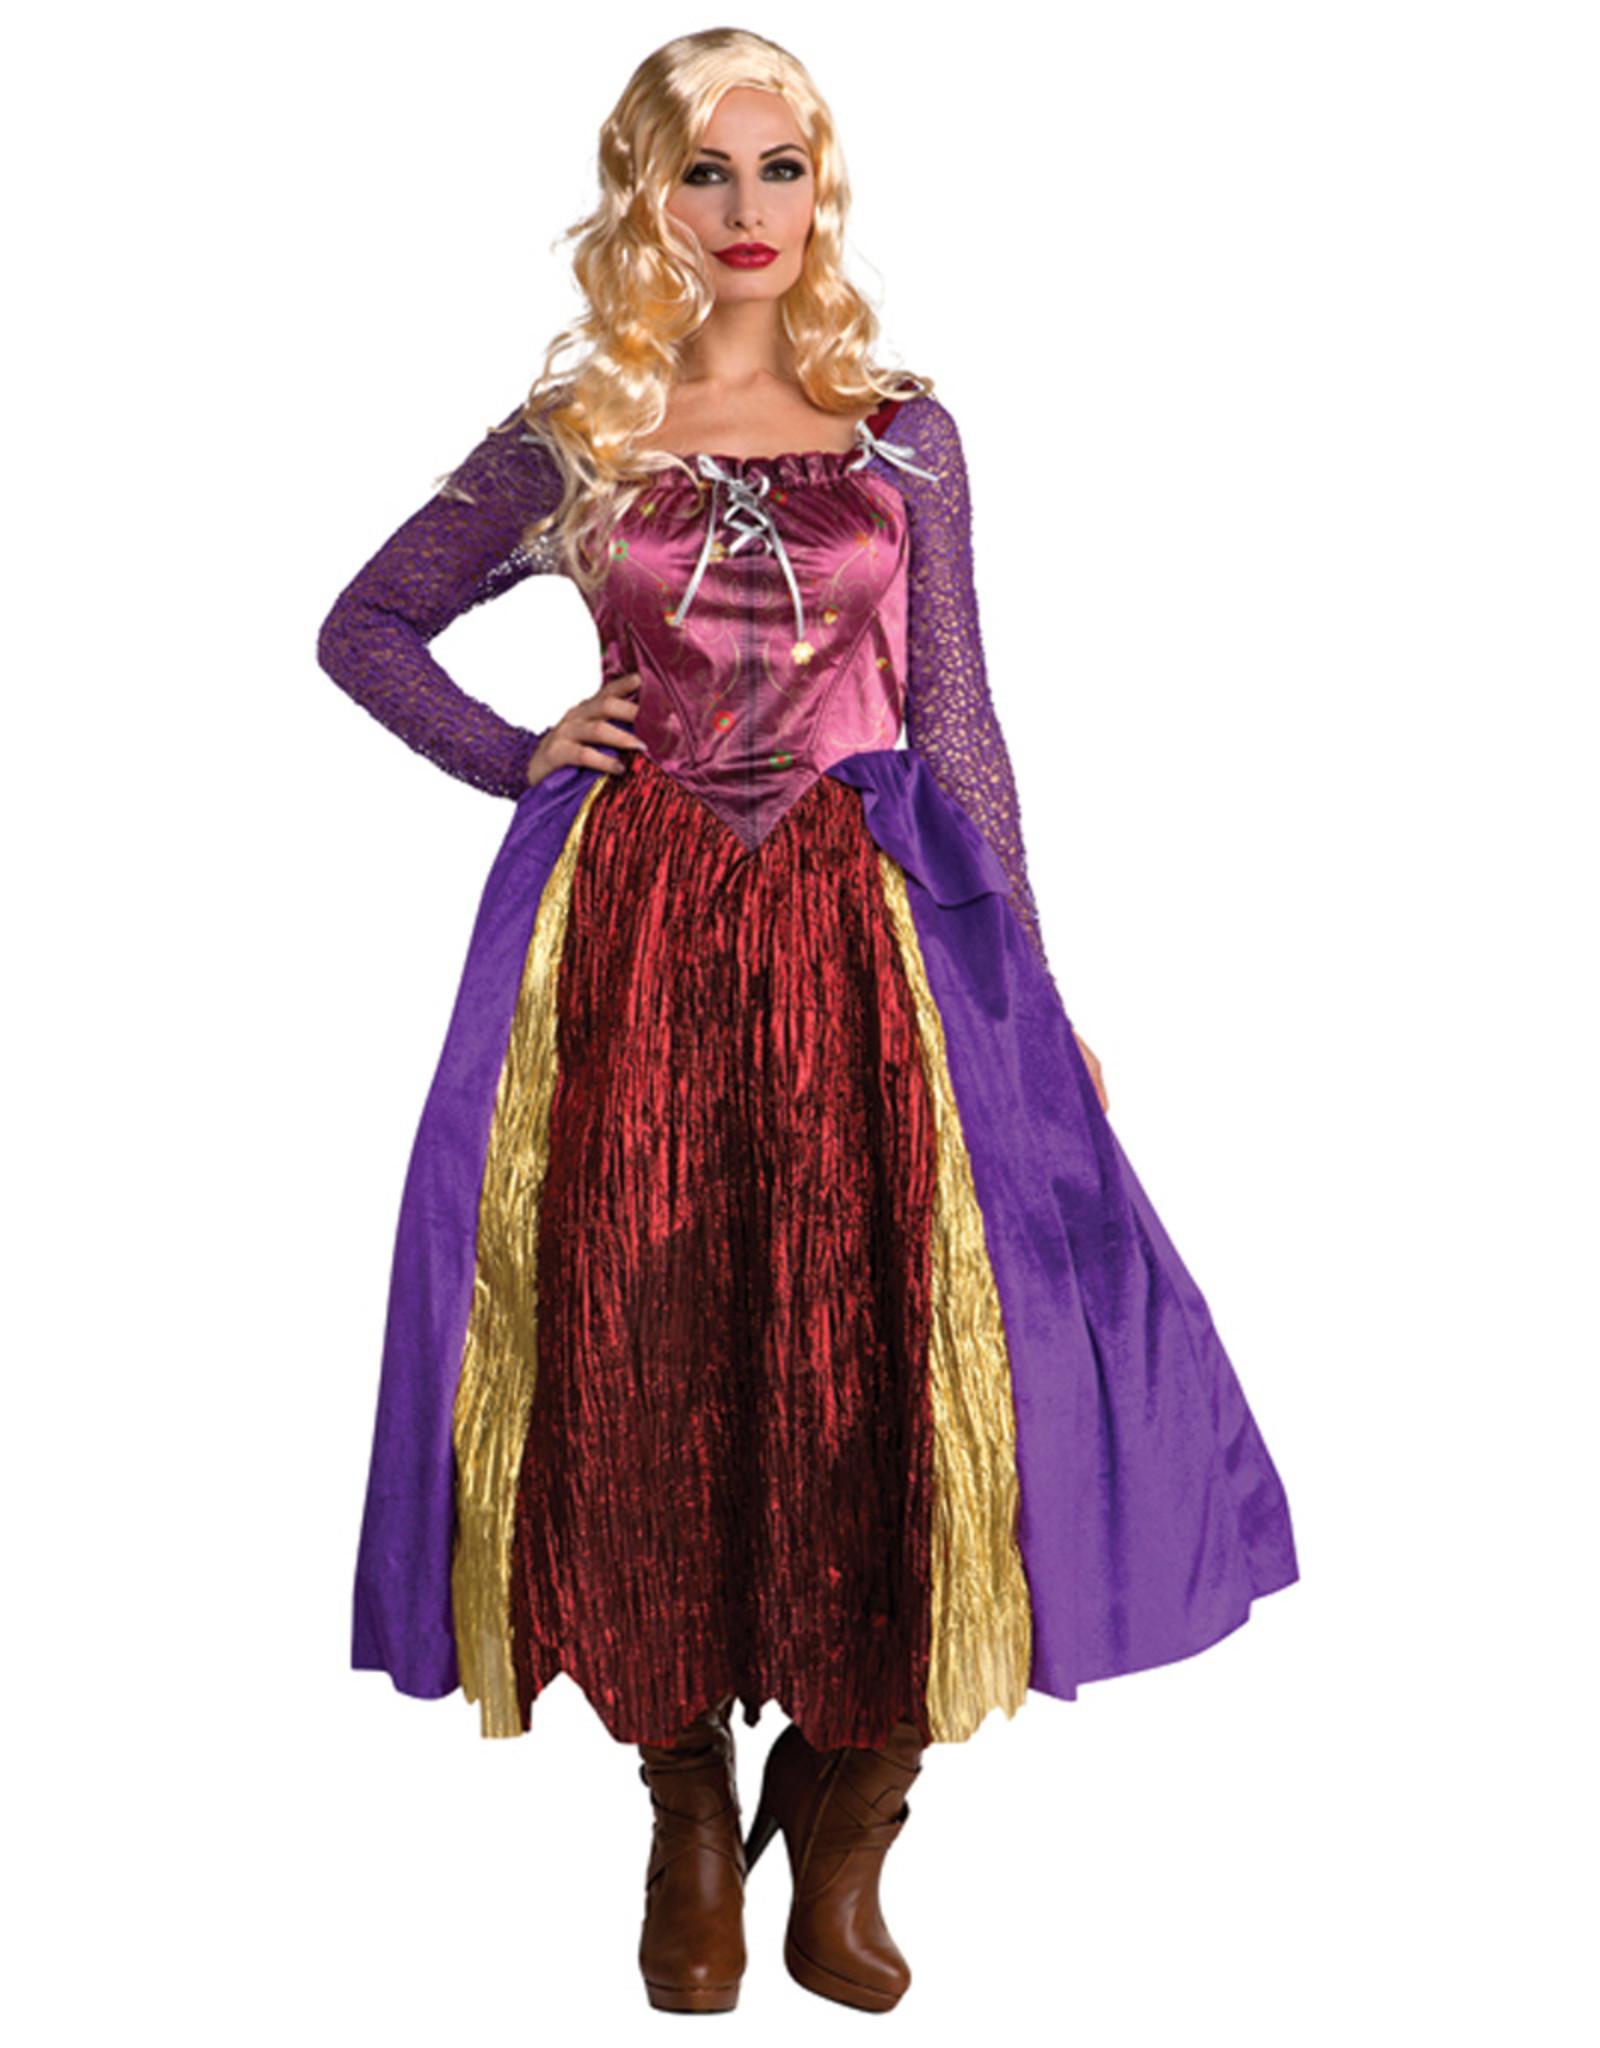 Silly Salem Sister Costume - Women's